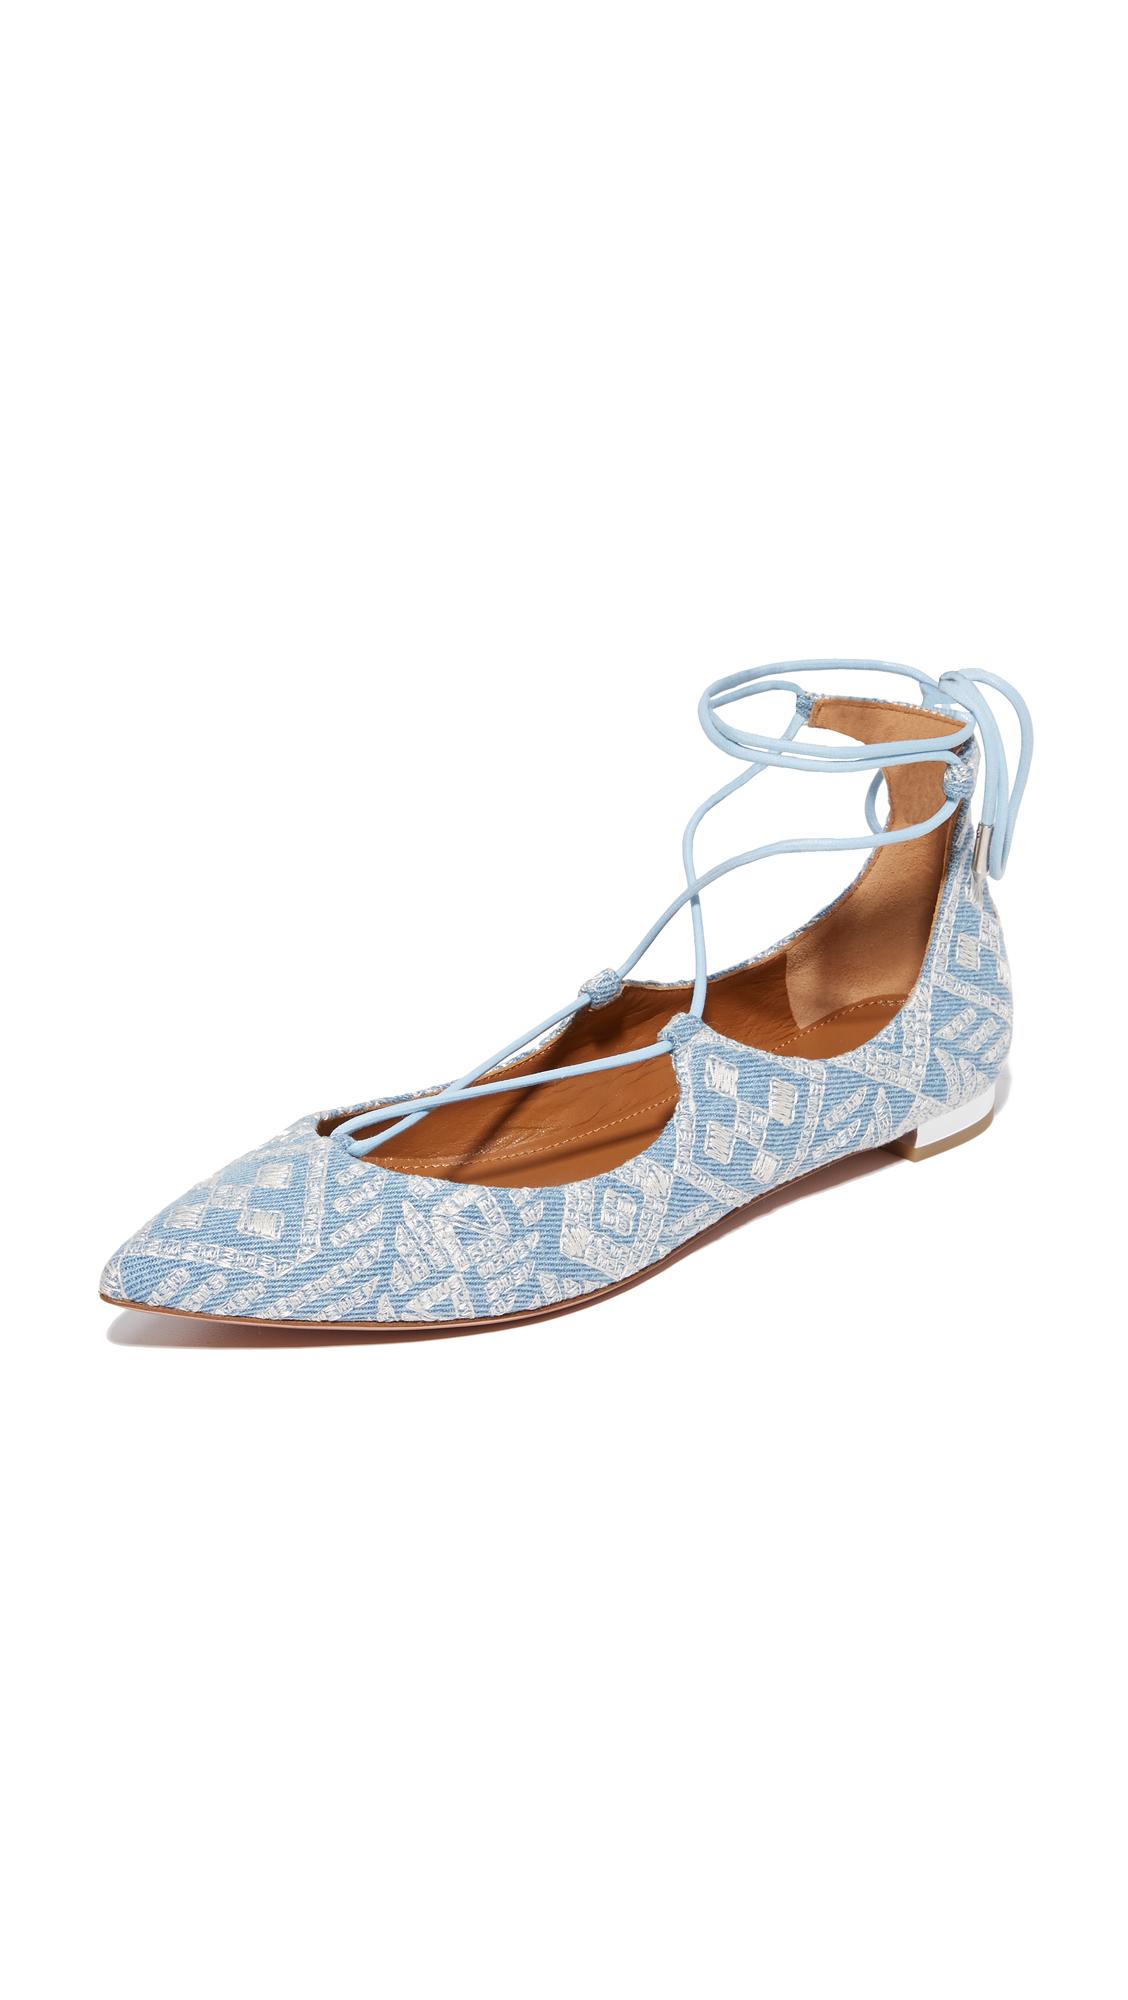 Aquazzura Christy Embroidery Flats - Light Blue